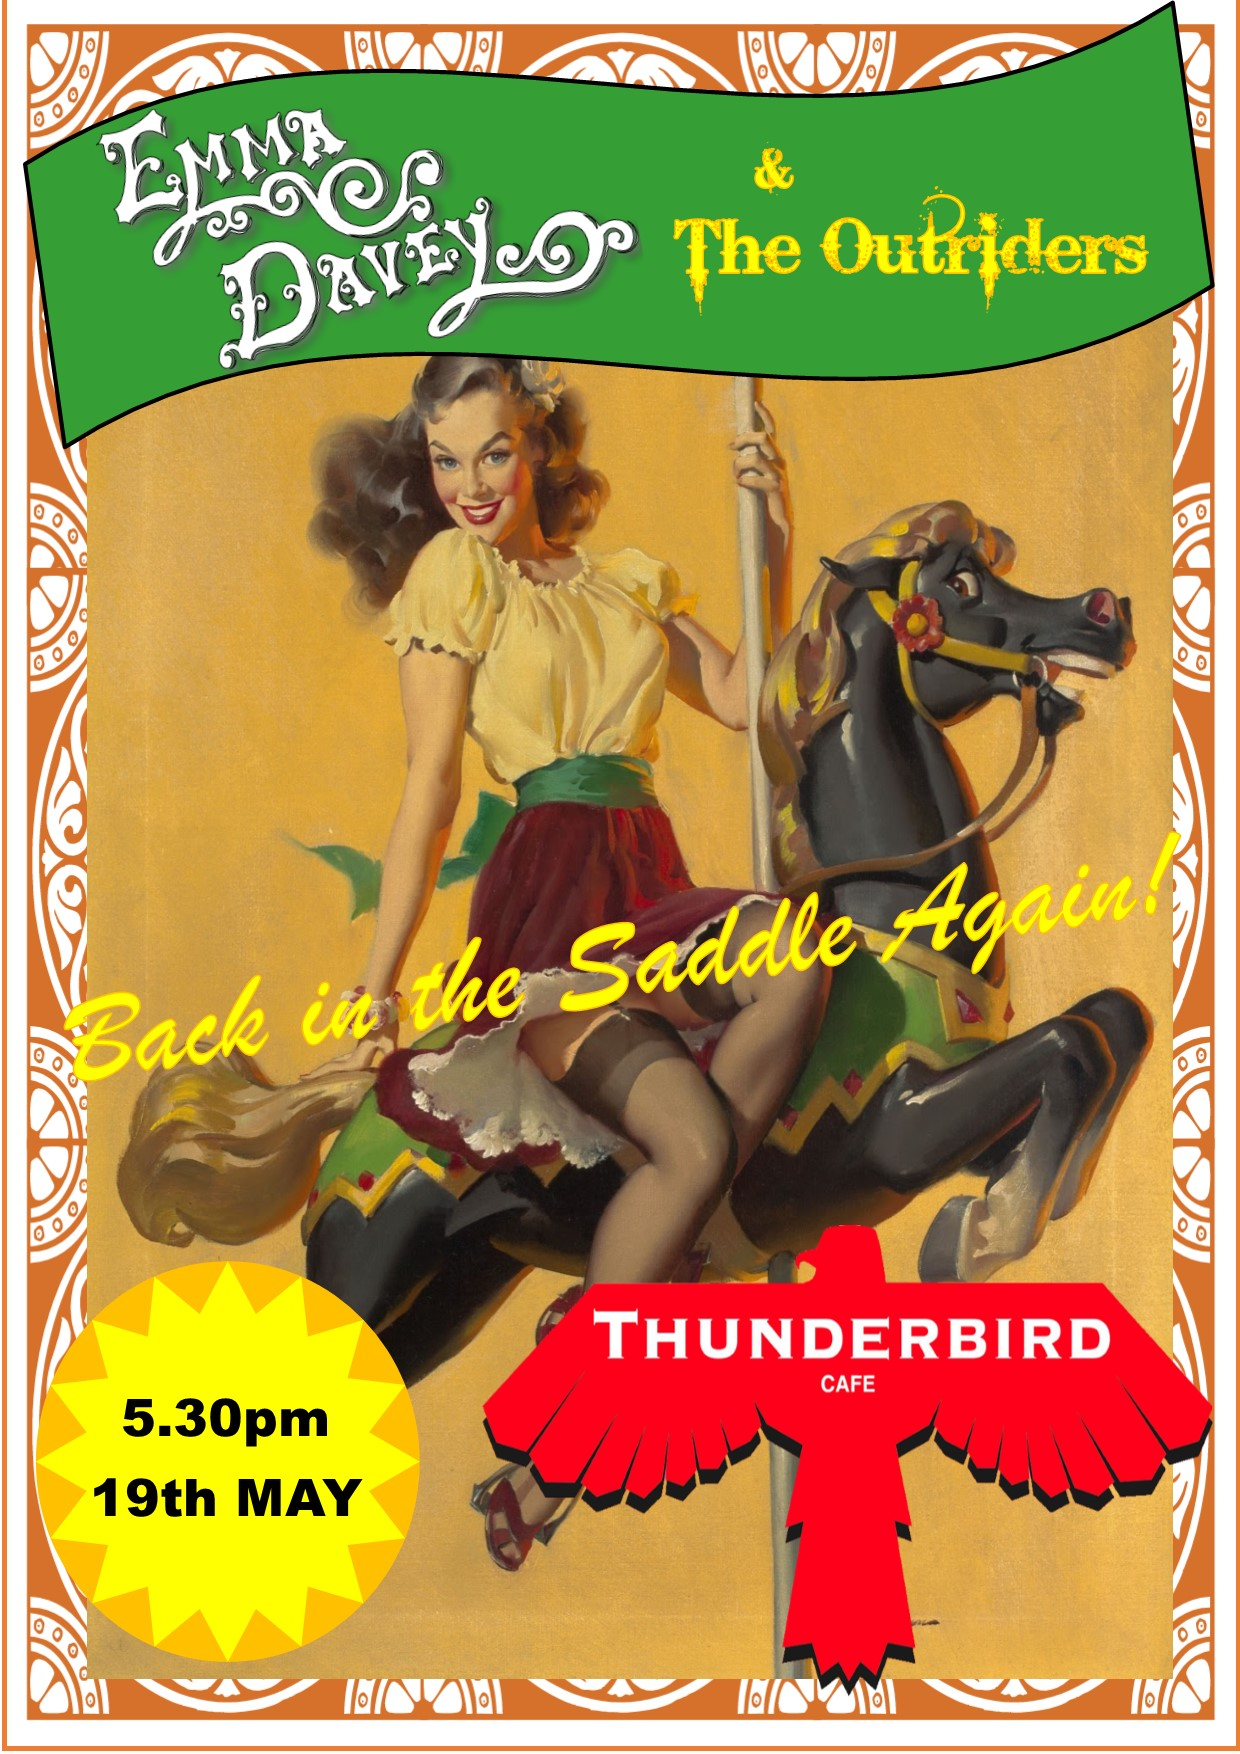 ThunderbirdMay17.jpg